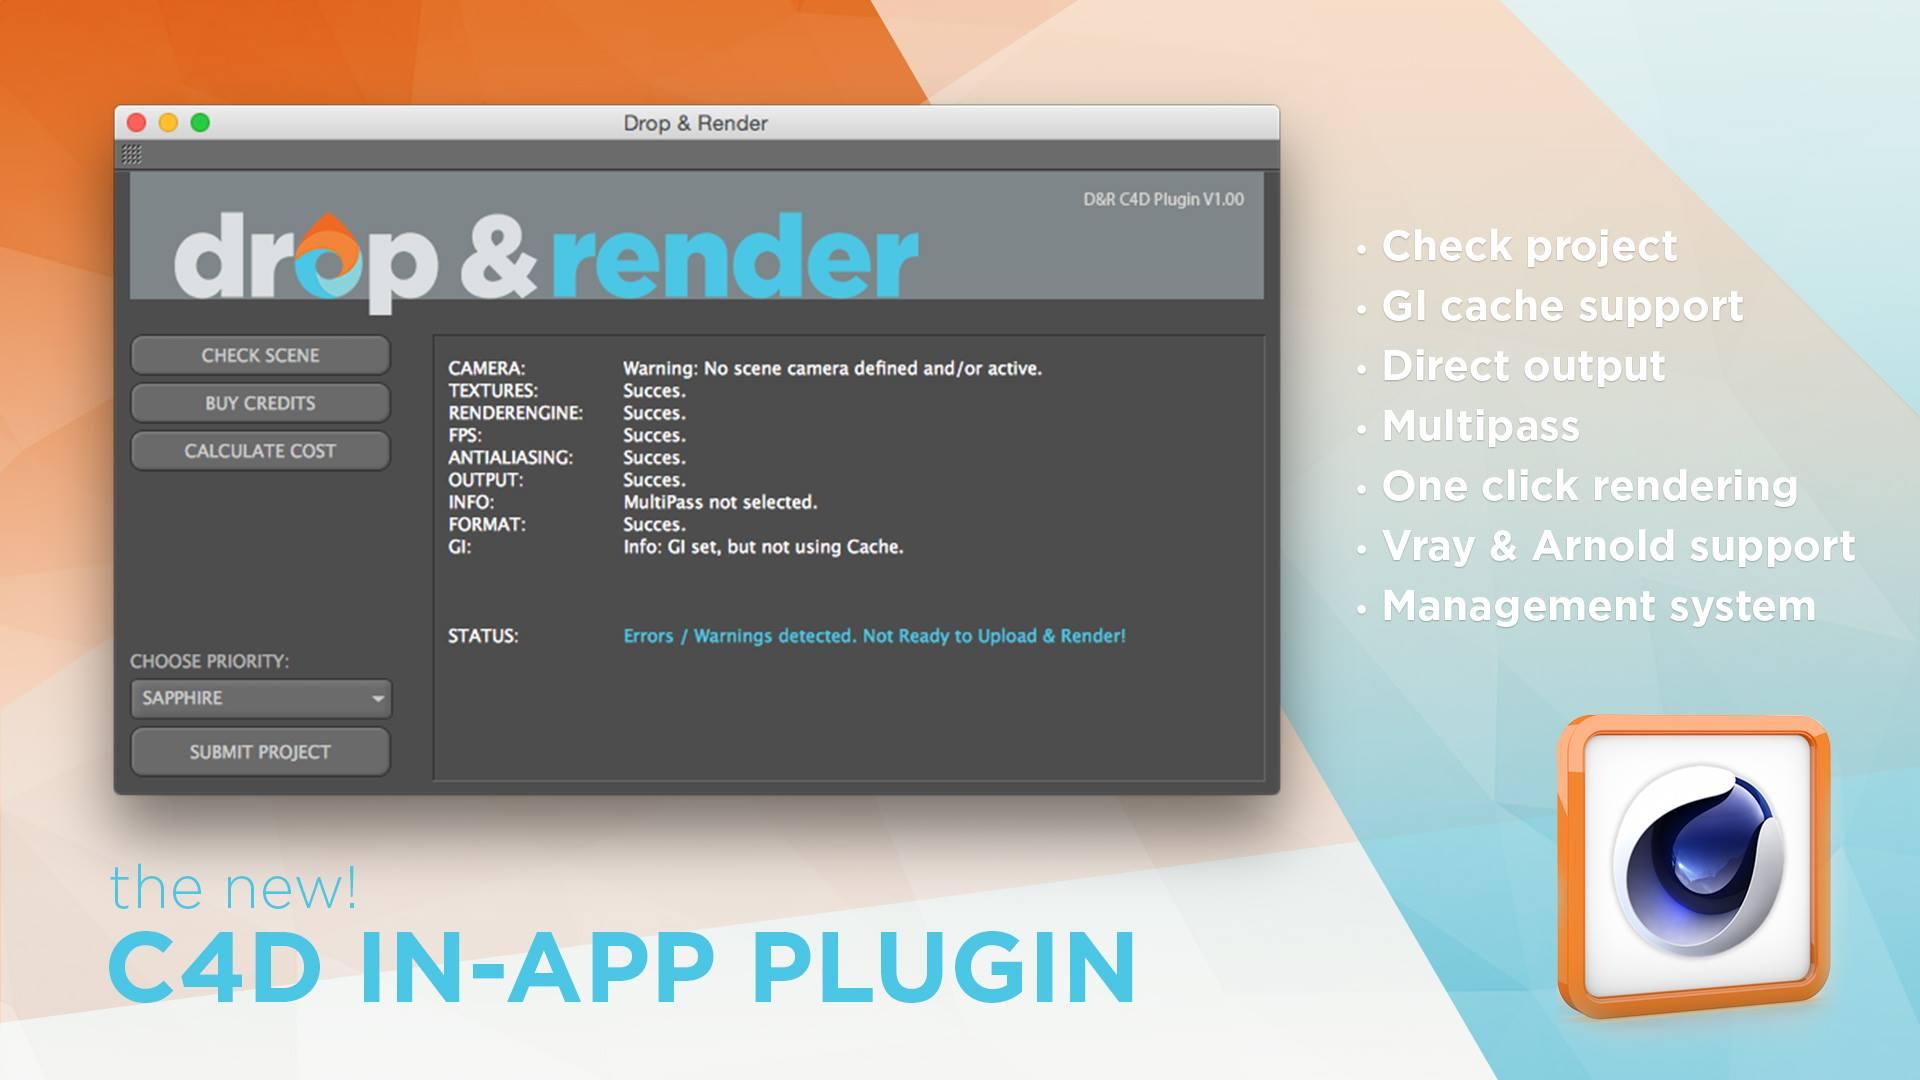 Drop & Render C4D Render Plugin   The Great Summit